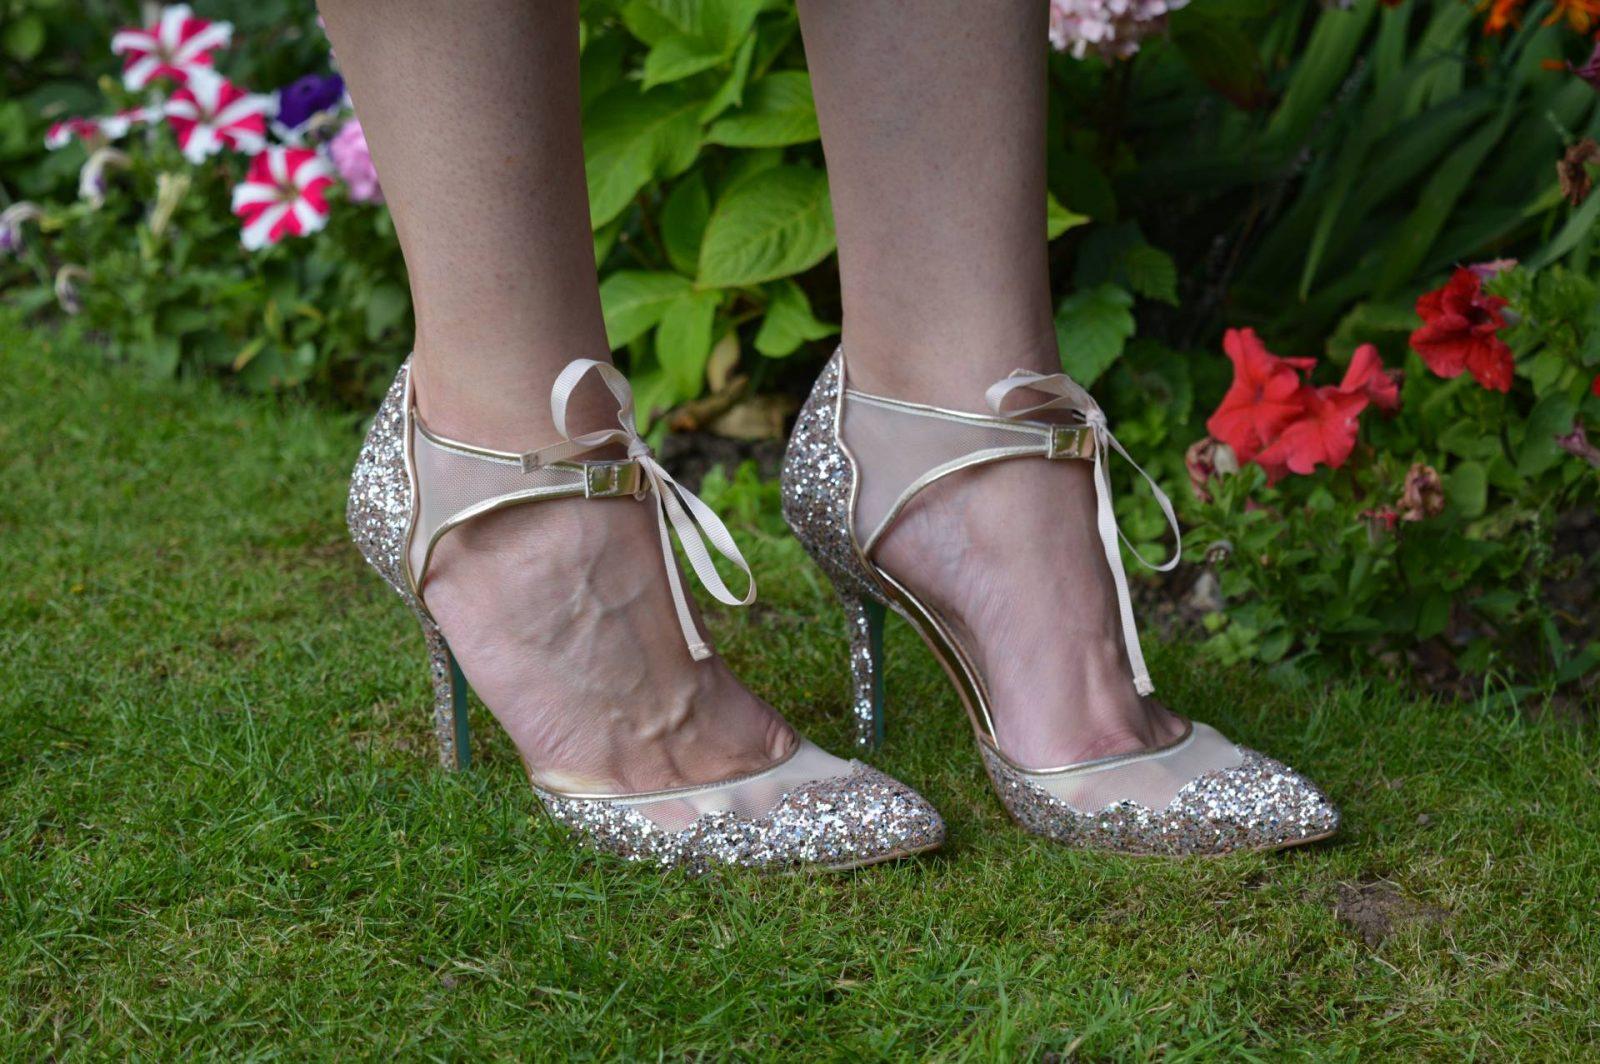 Betsey Johnson rose gold glitter shoes